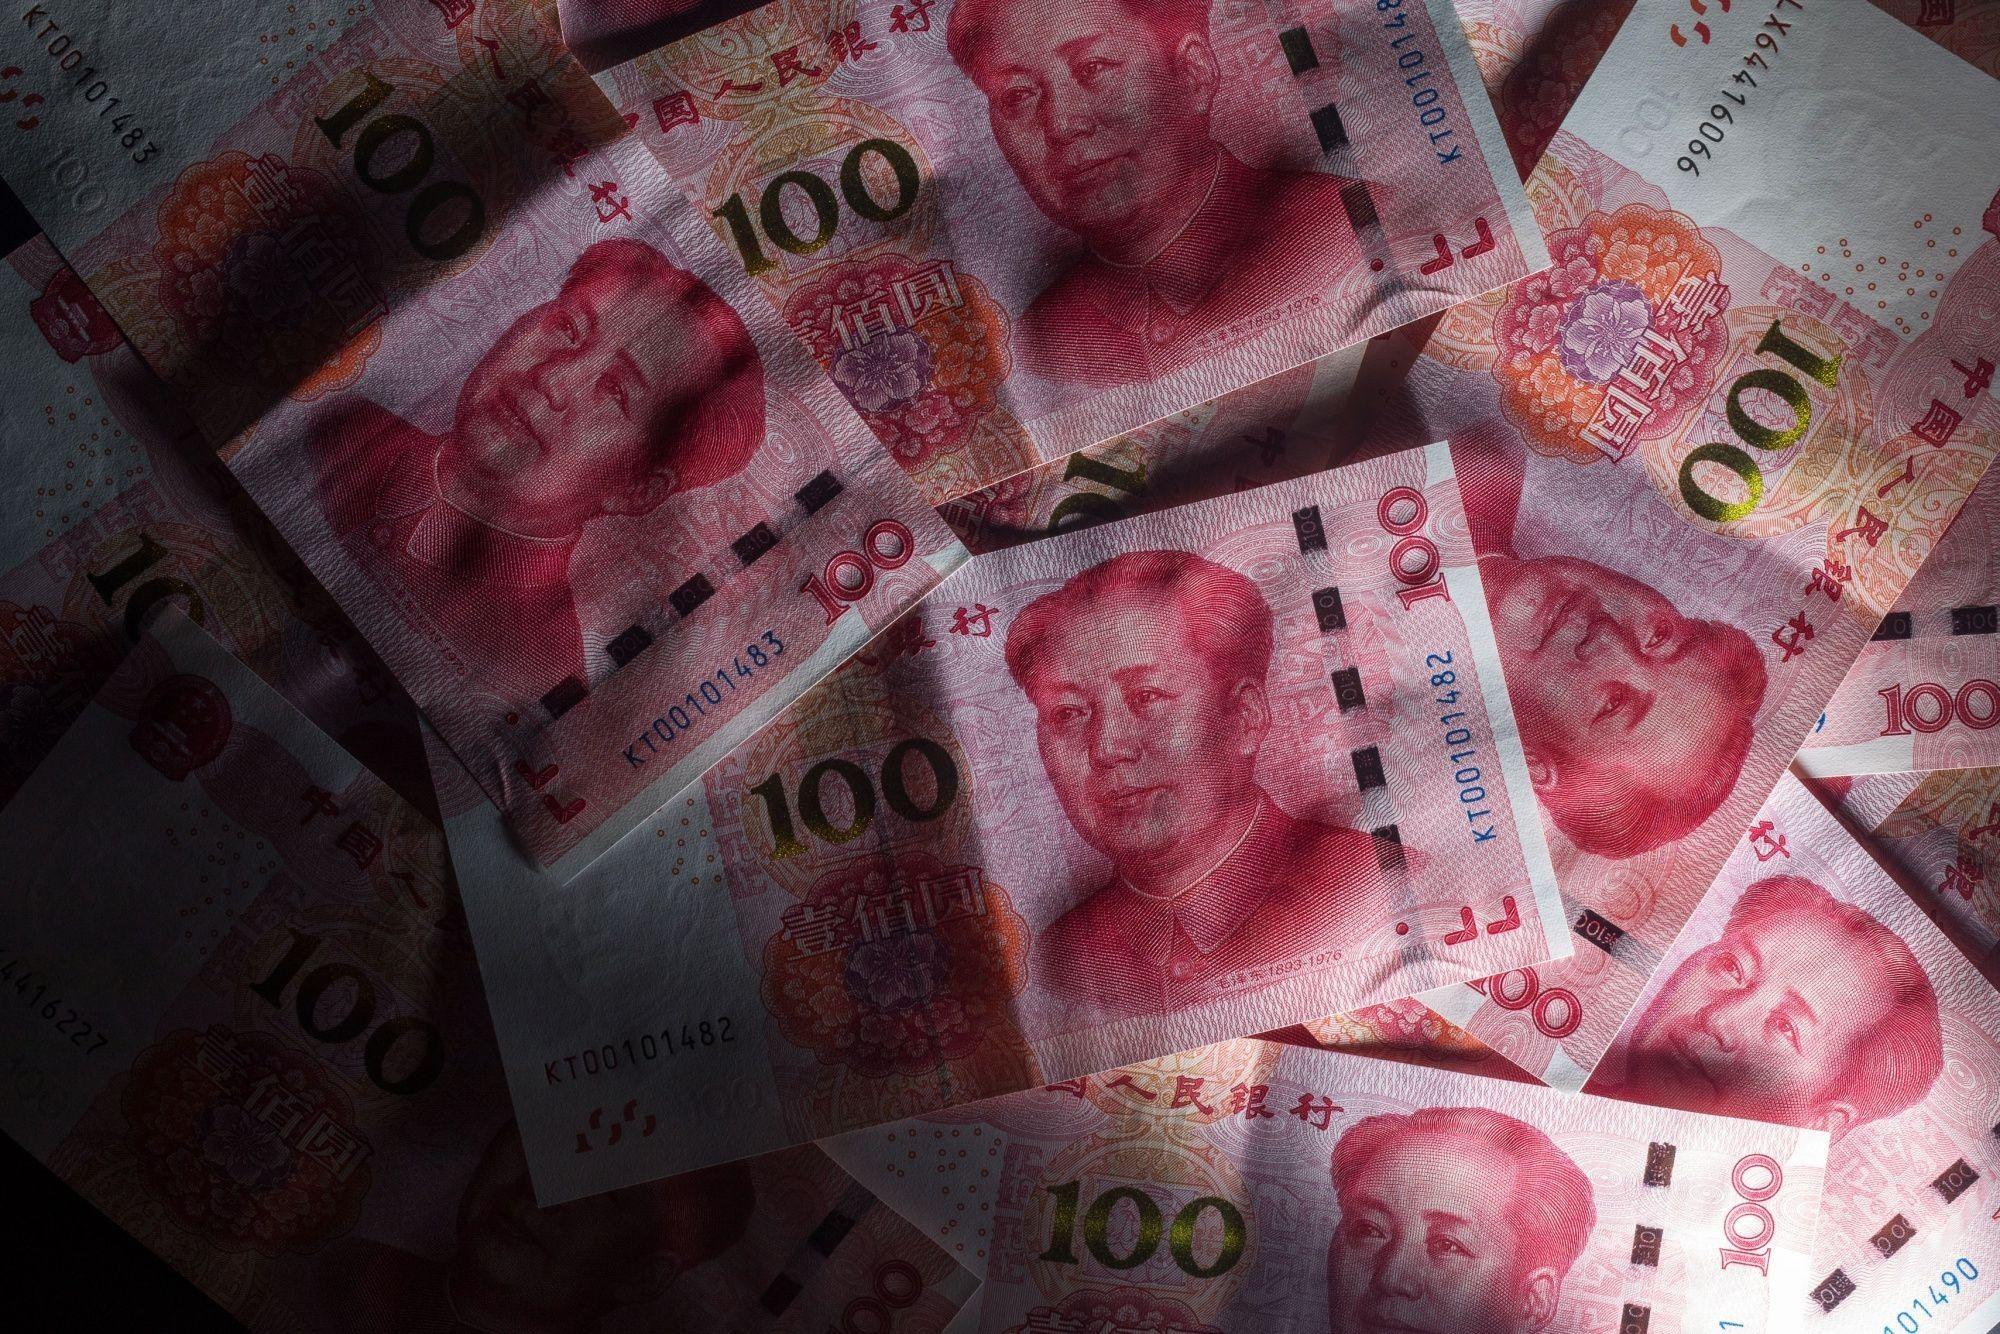 U.S. Labels China a Currency Manipulator, Escalating Trade War